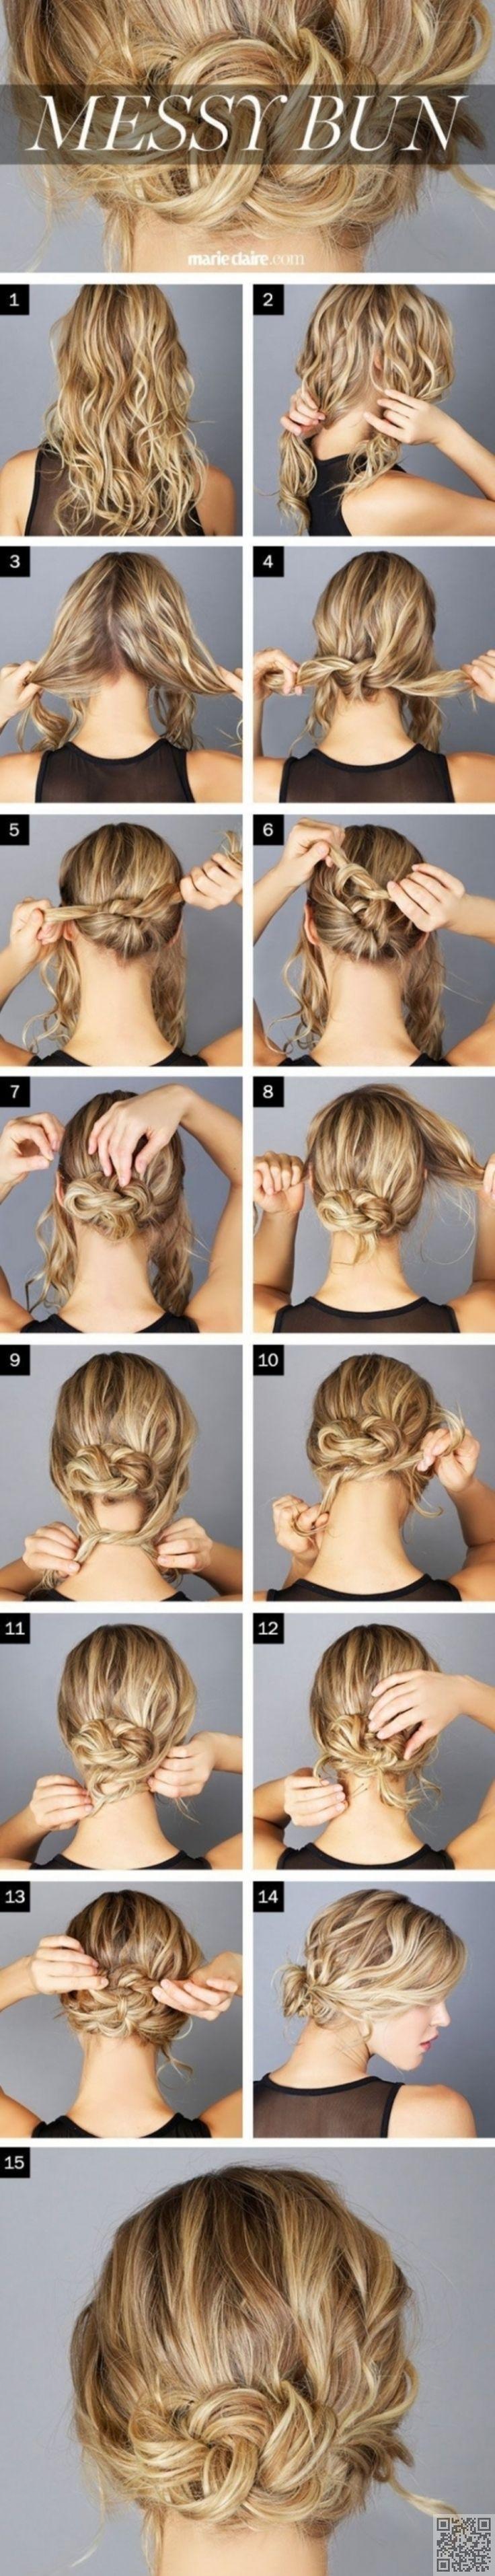 10. #Messy Bun - 16 Gorgeous Hair #Styles for Lazy Girls like Me ... → Hair #Knotpony